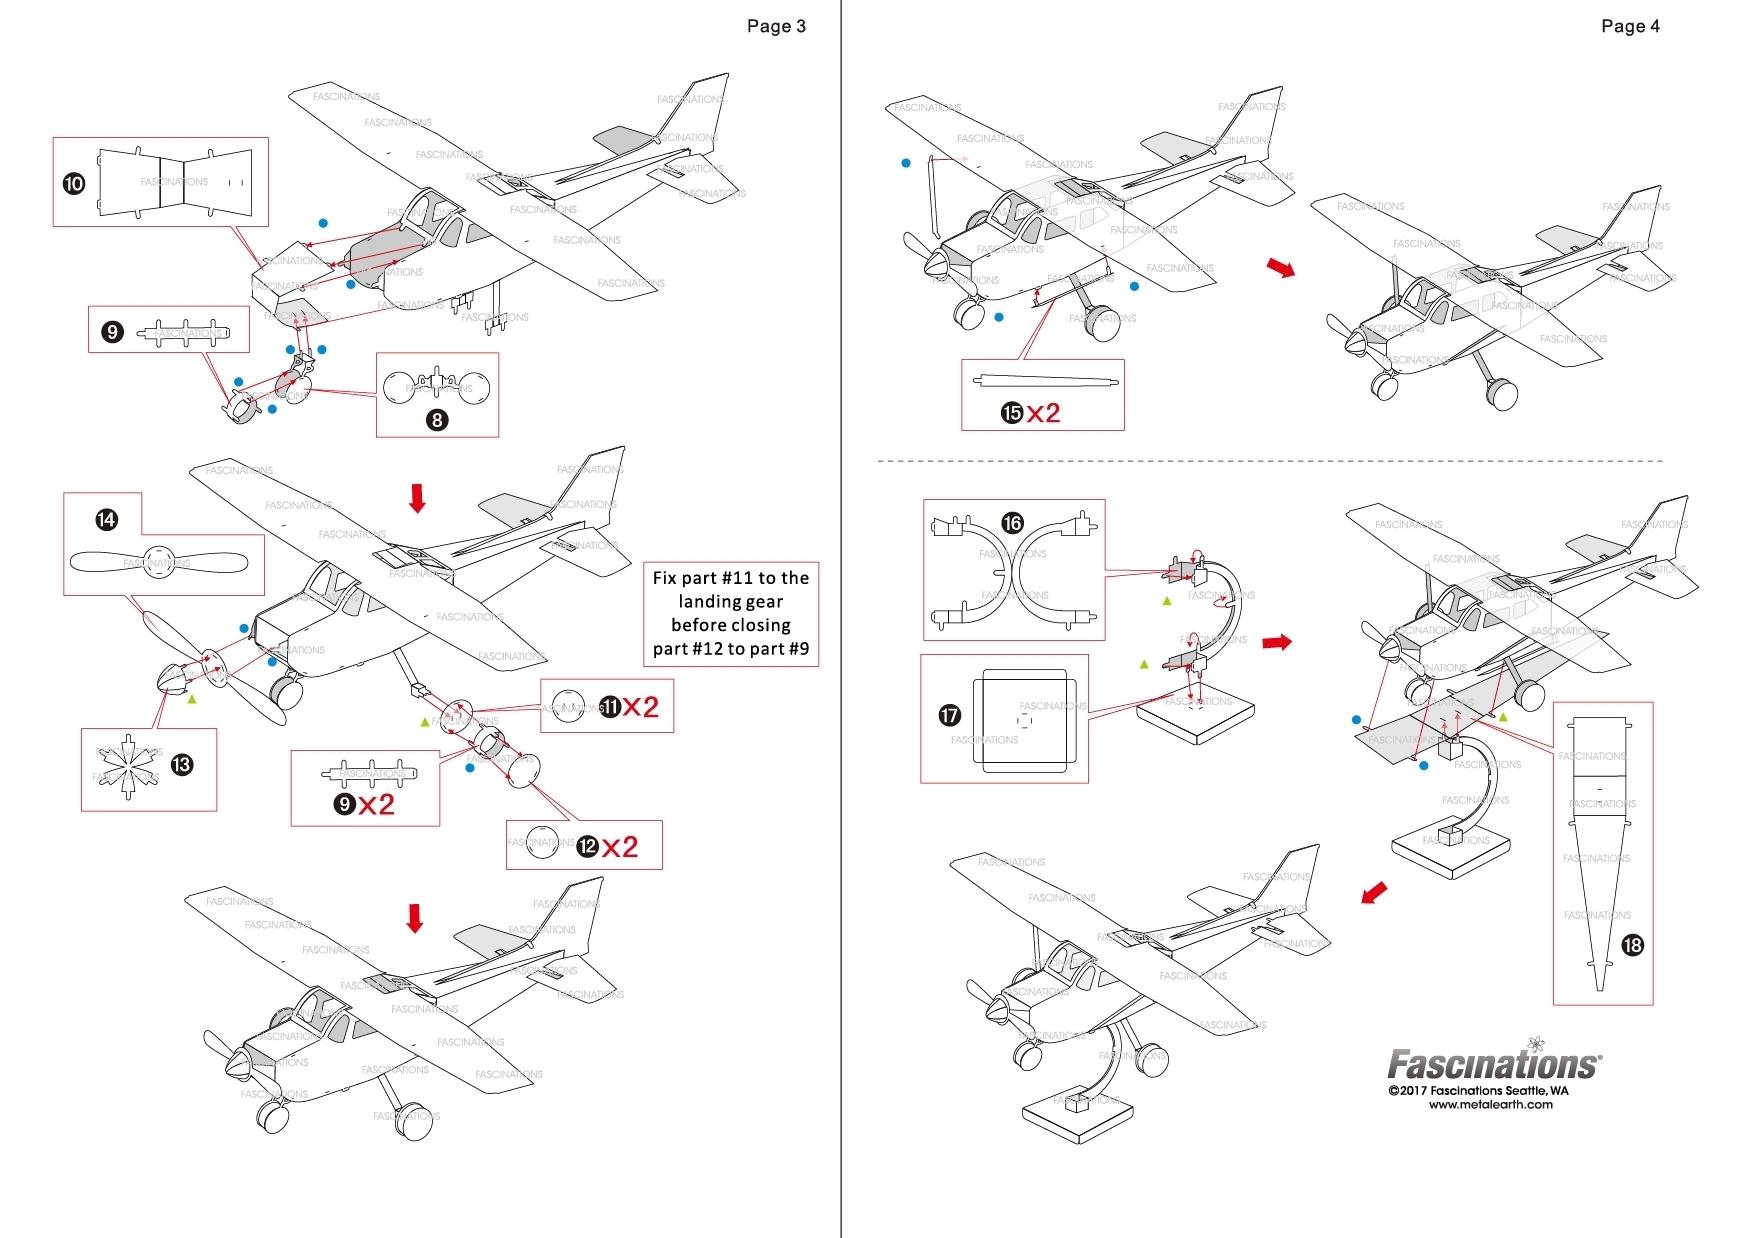 c172 engine diagram engine blueprint wiring diagram